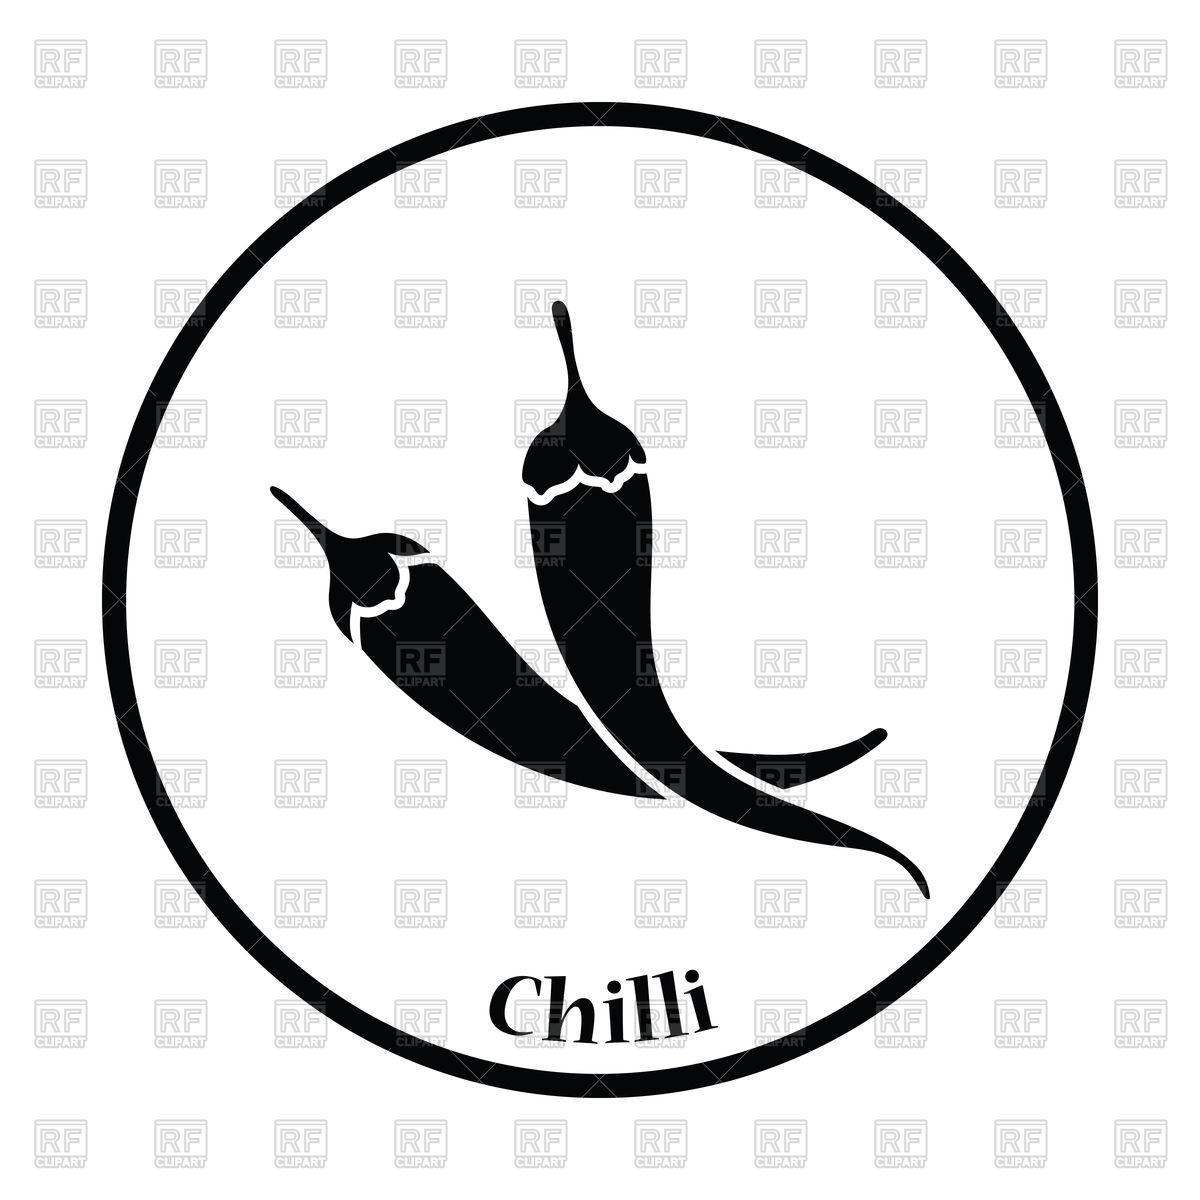 1200x1200 Chili Pepper Icon Vector Image Vector Artwork Of Signs, Symbols